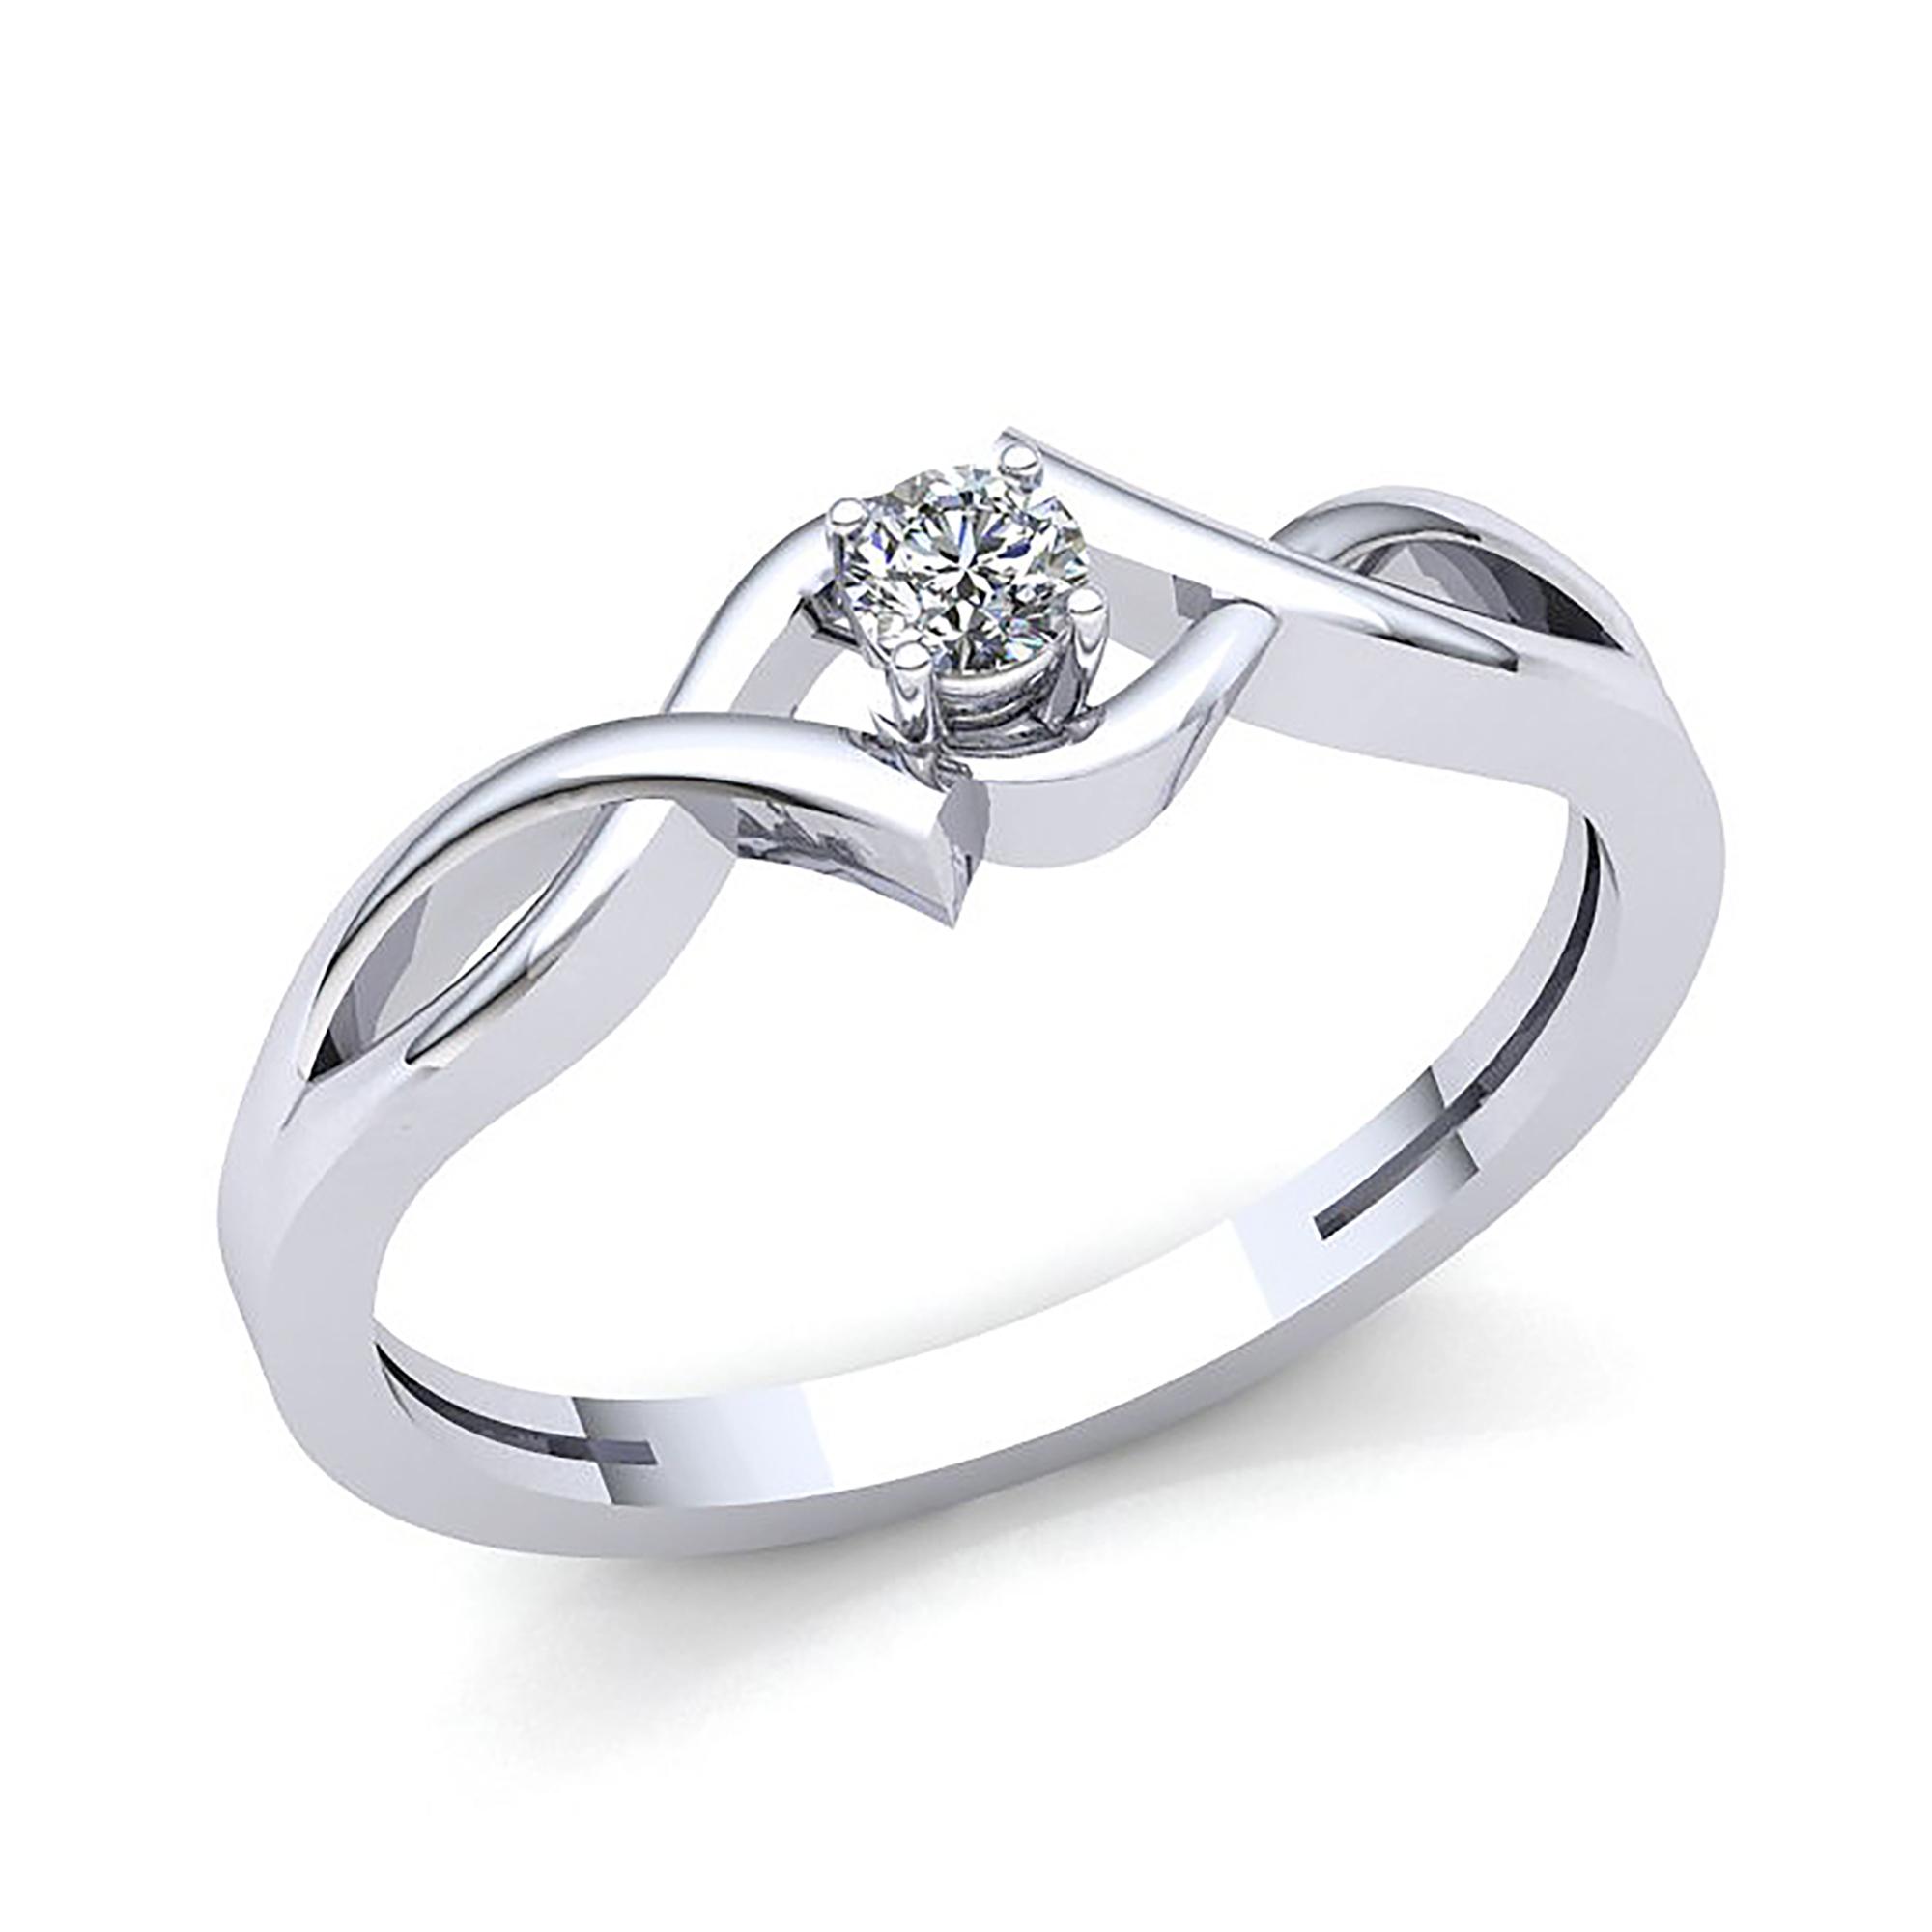 Details about Genuine 1 4ctw Round Diamond Women s Bridal Solitaire Engagement  Ring 18K Gold db1957f4da